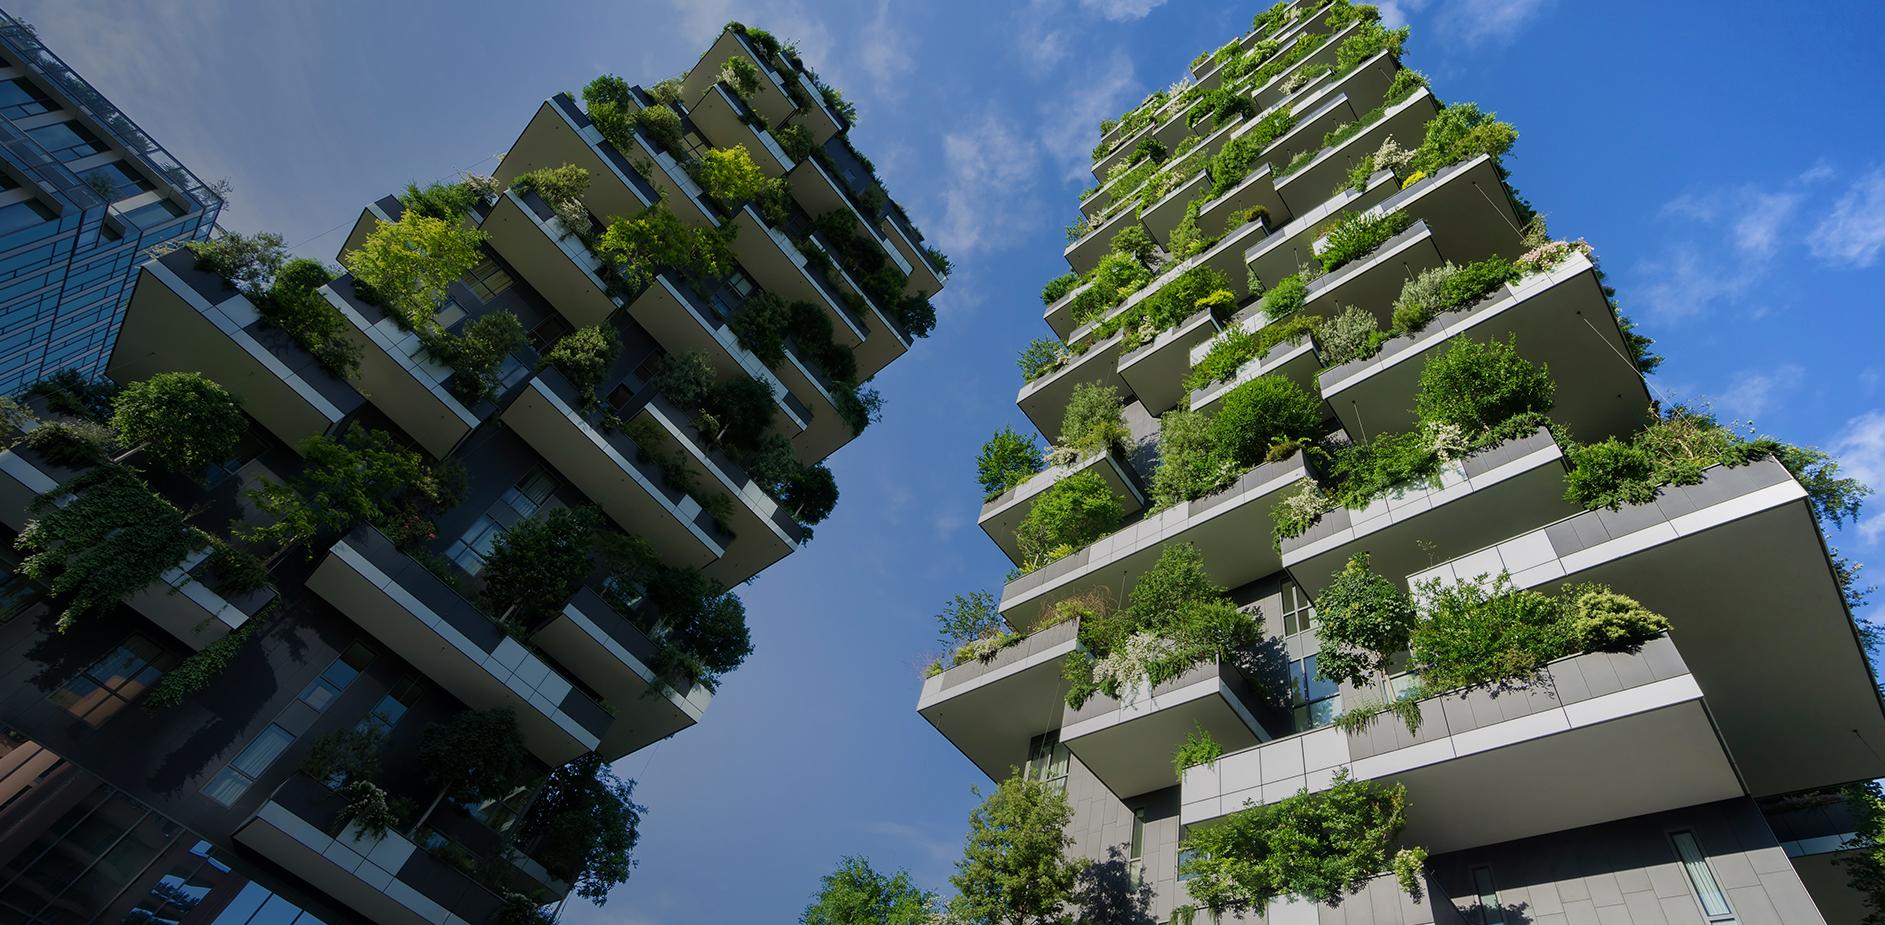 Green Housing Architecture